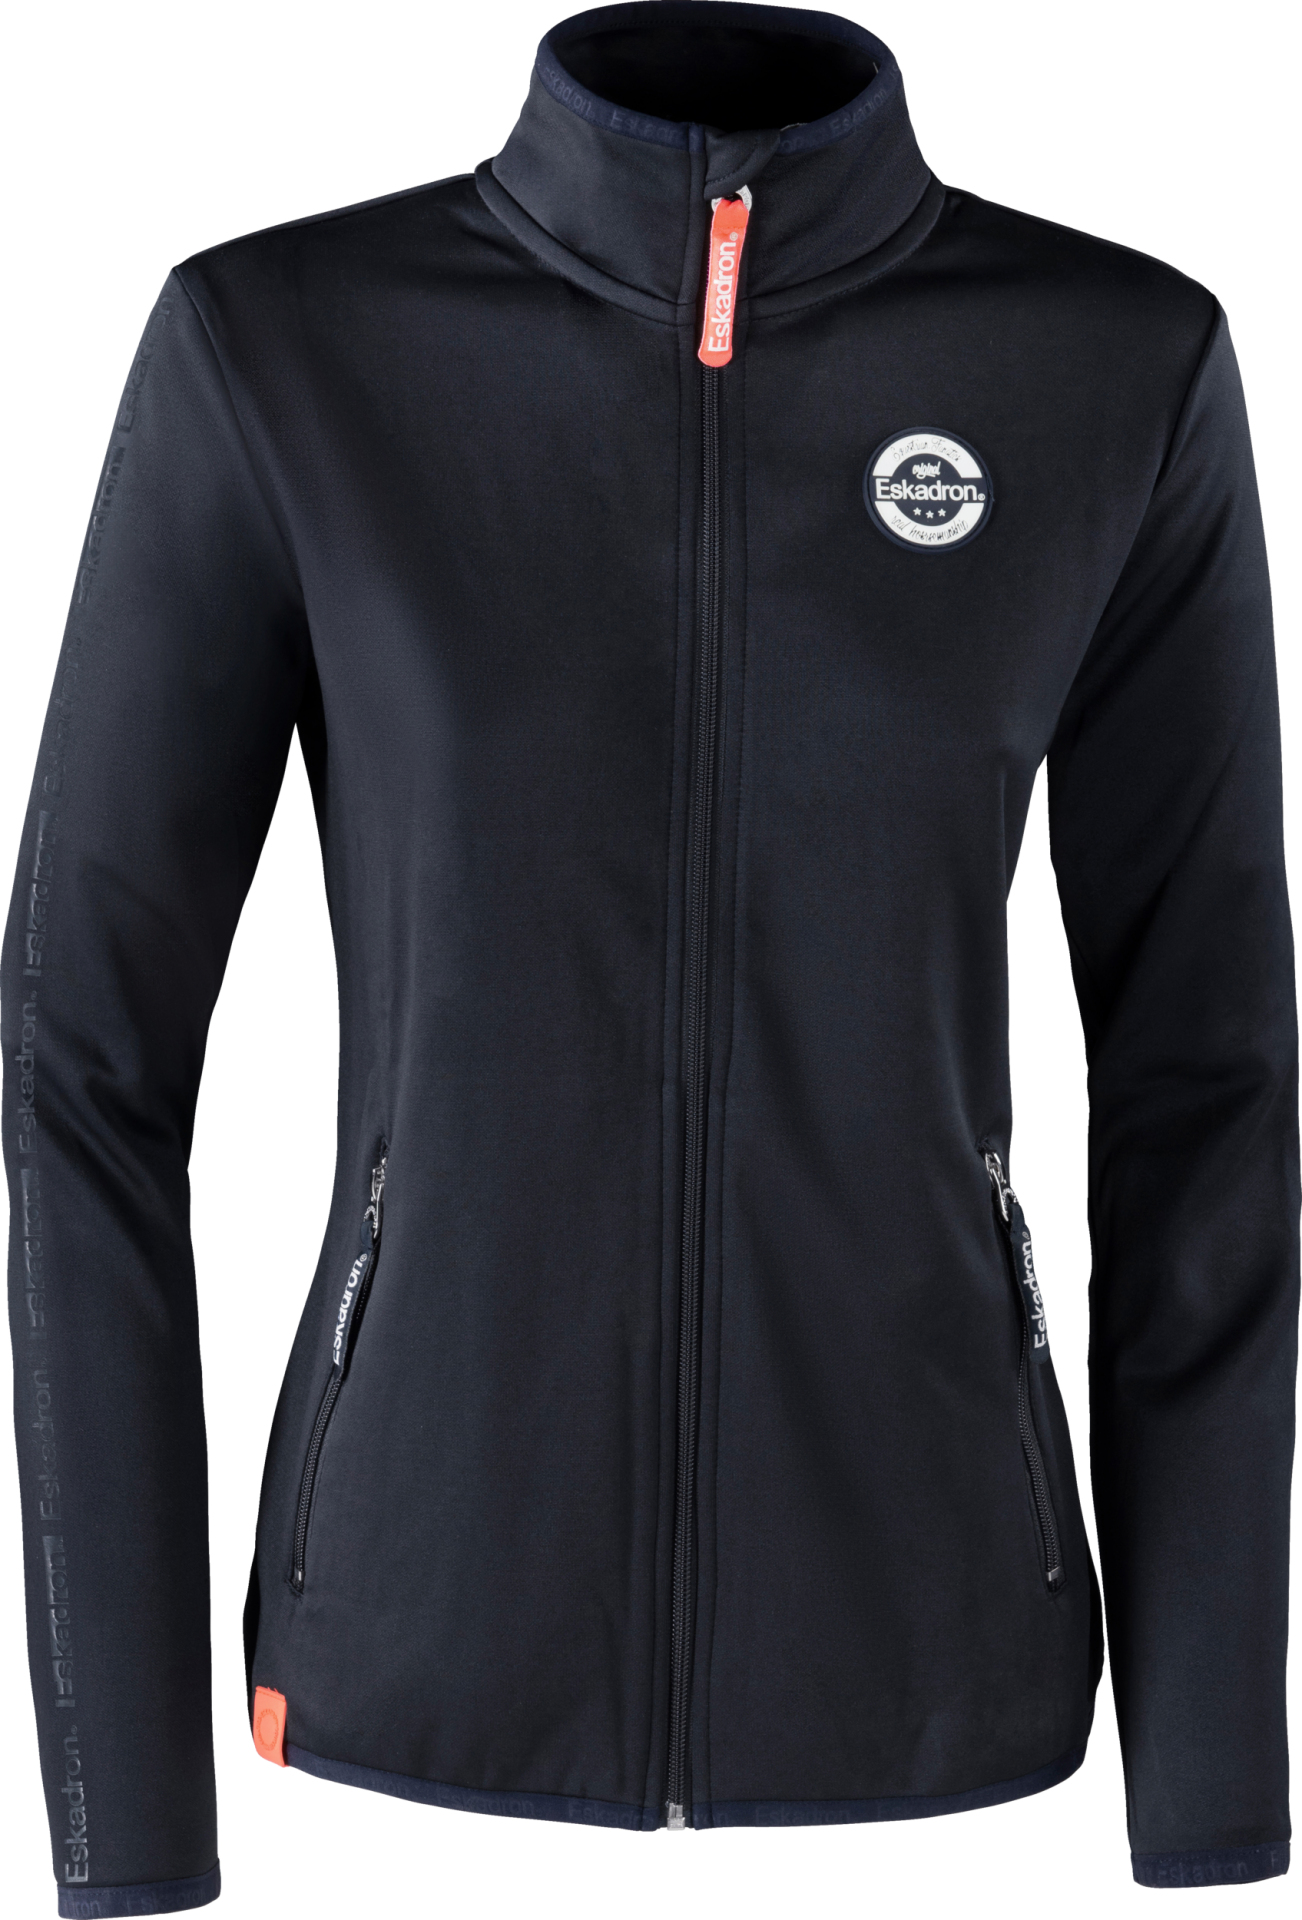 Eskadron NICKY Jersey Zip-Jacket